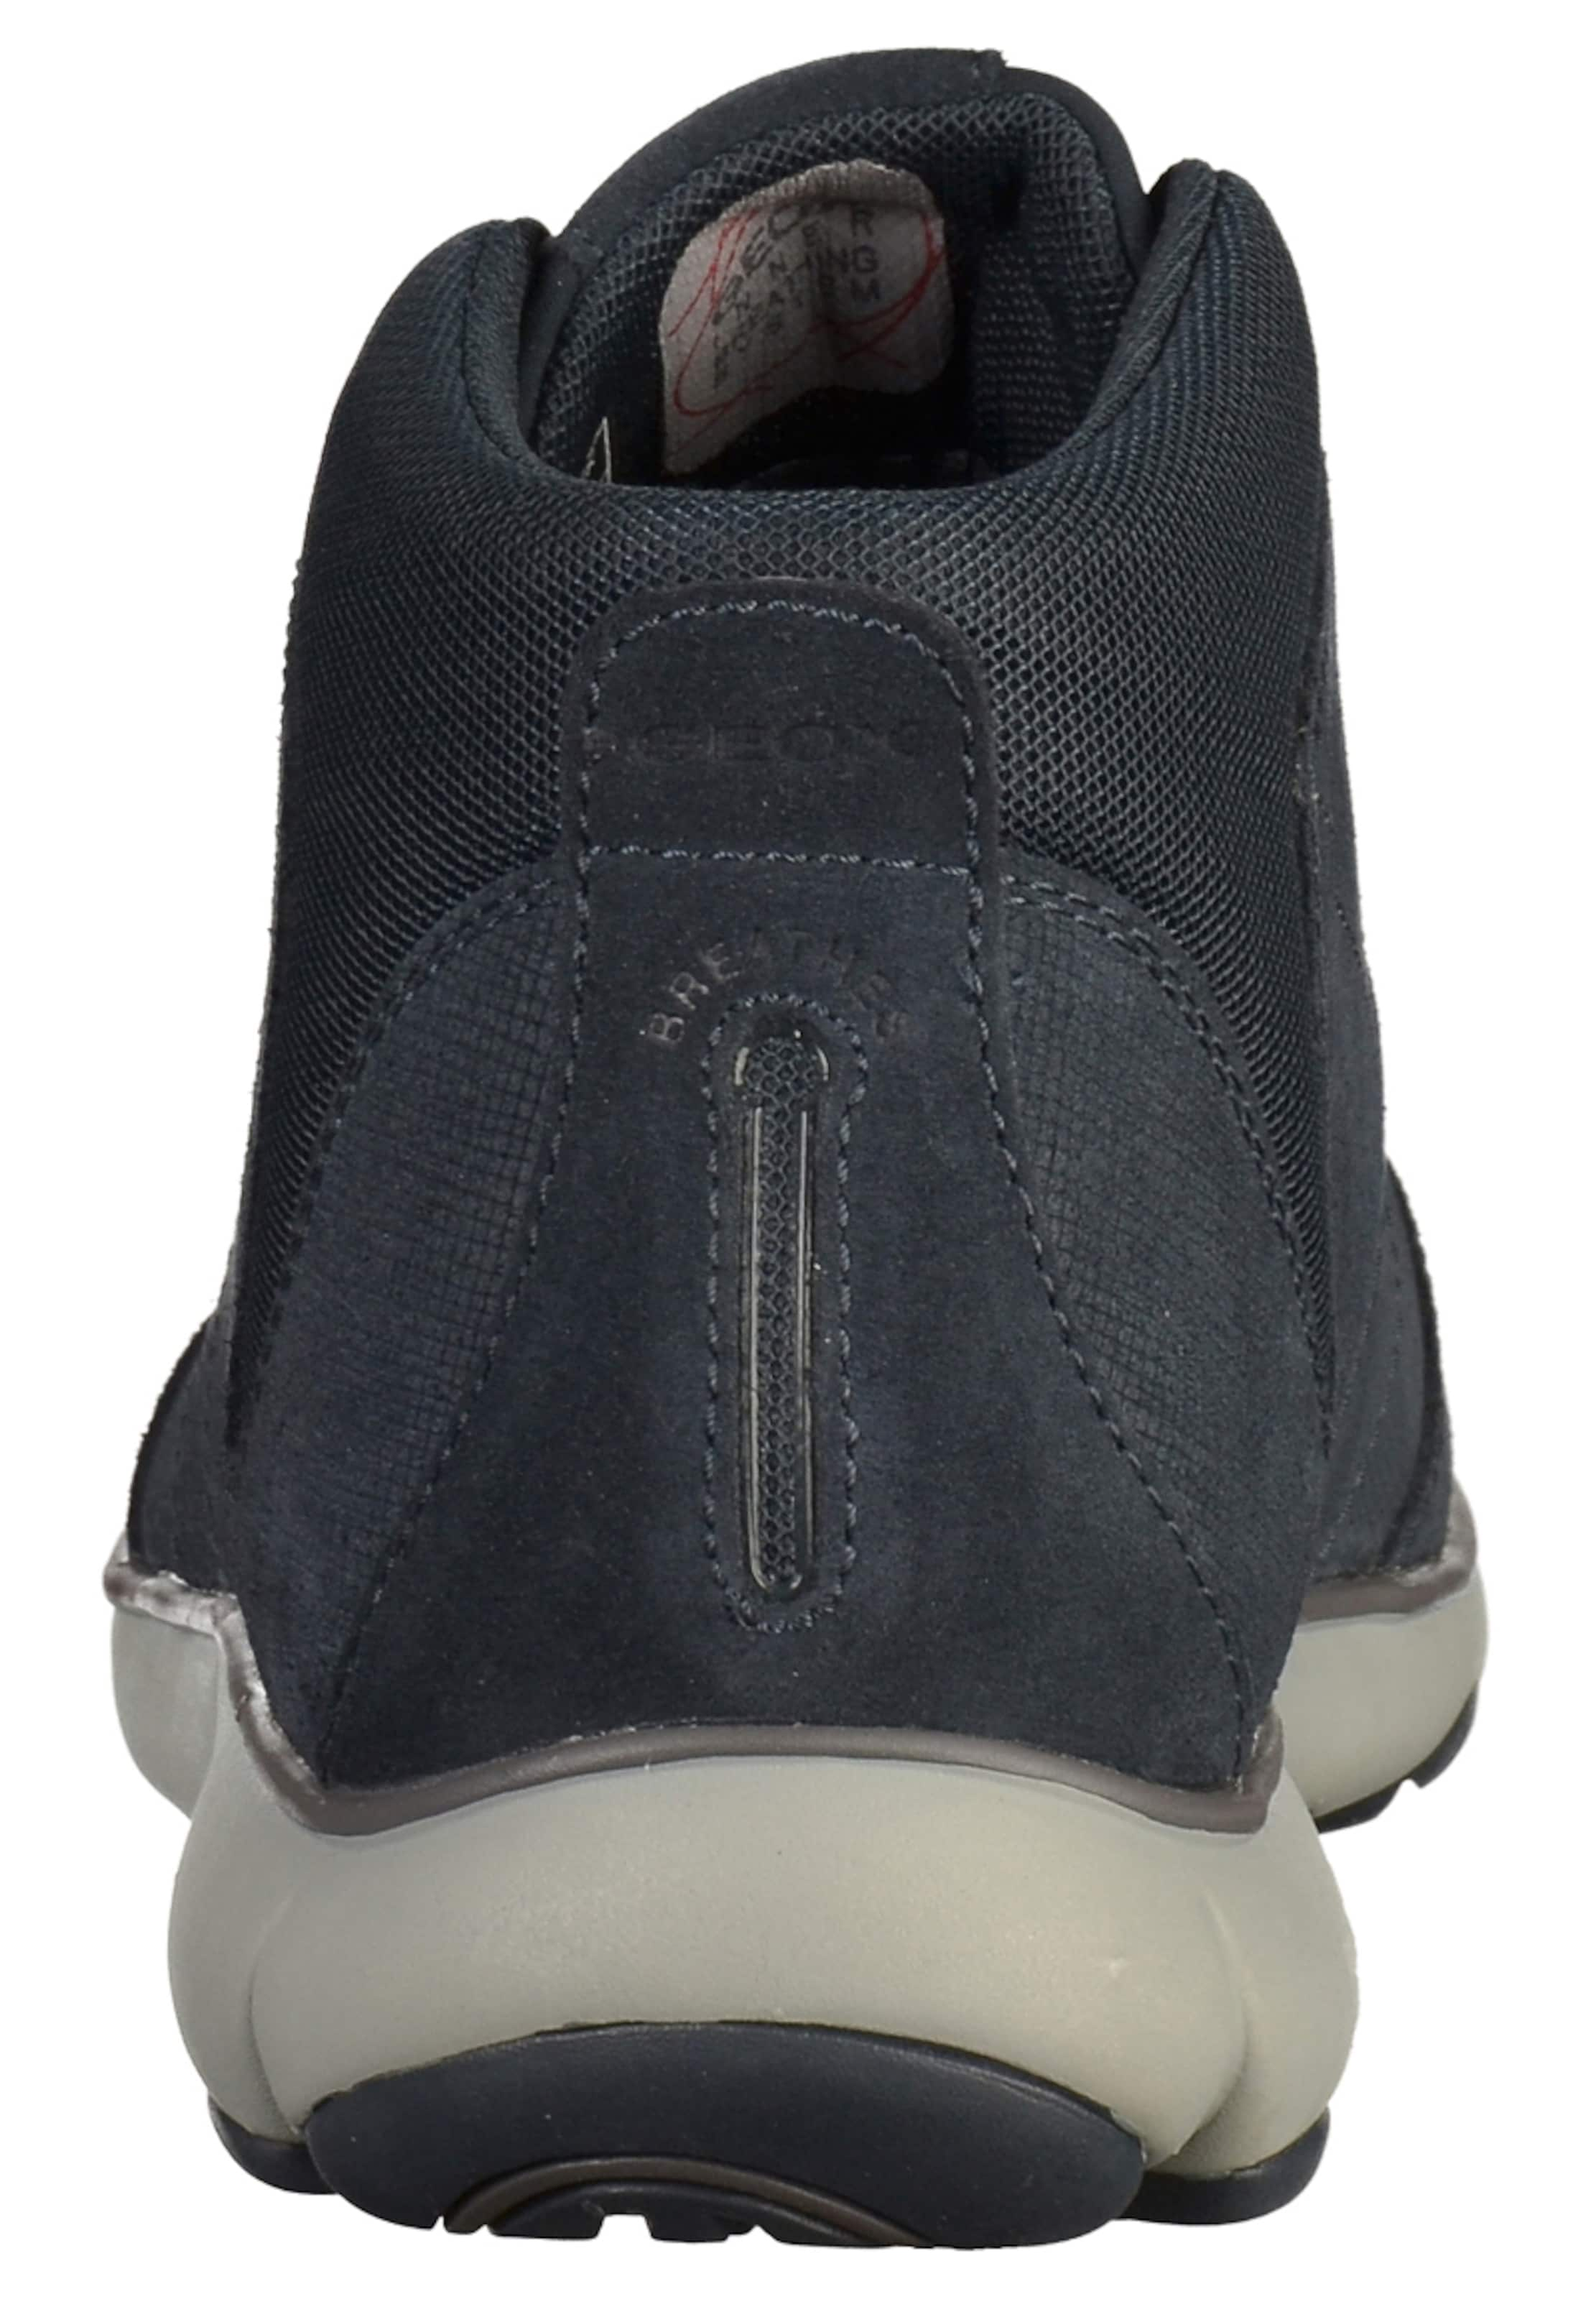 Geox Sneaker In Navy Geox Navy Geox In Sneaker pUzVqSM